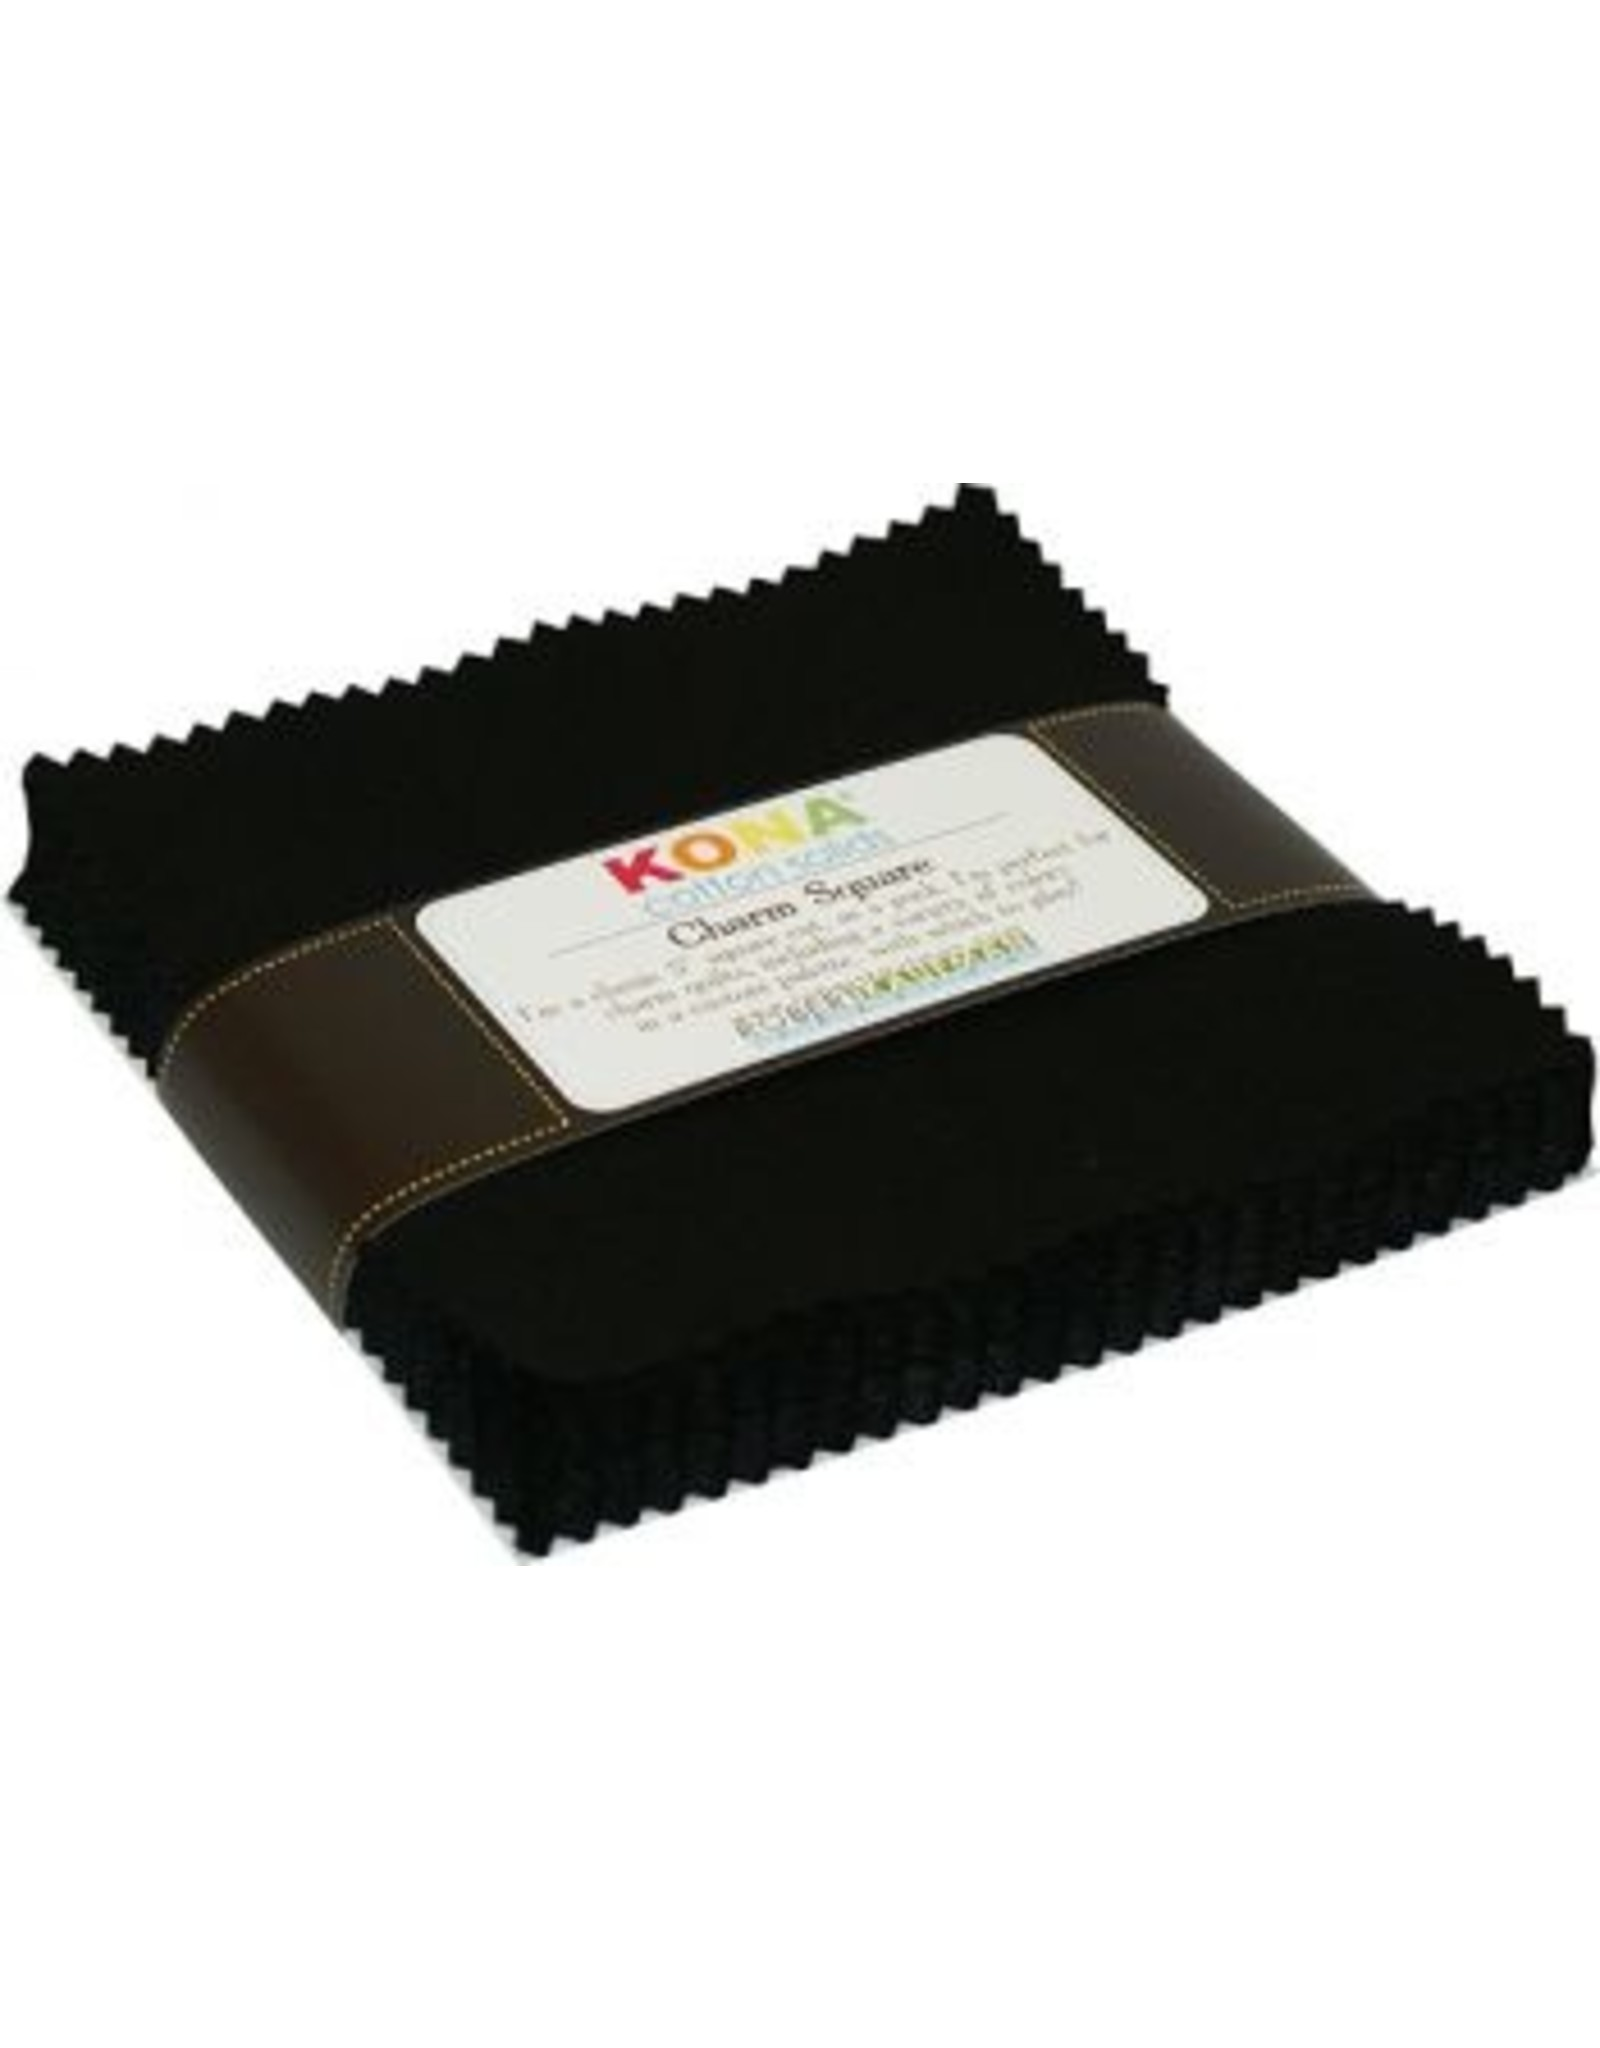 Robert Kaufman 5 x 5 inch Charm Squares - Kona Solids Black